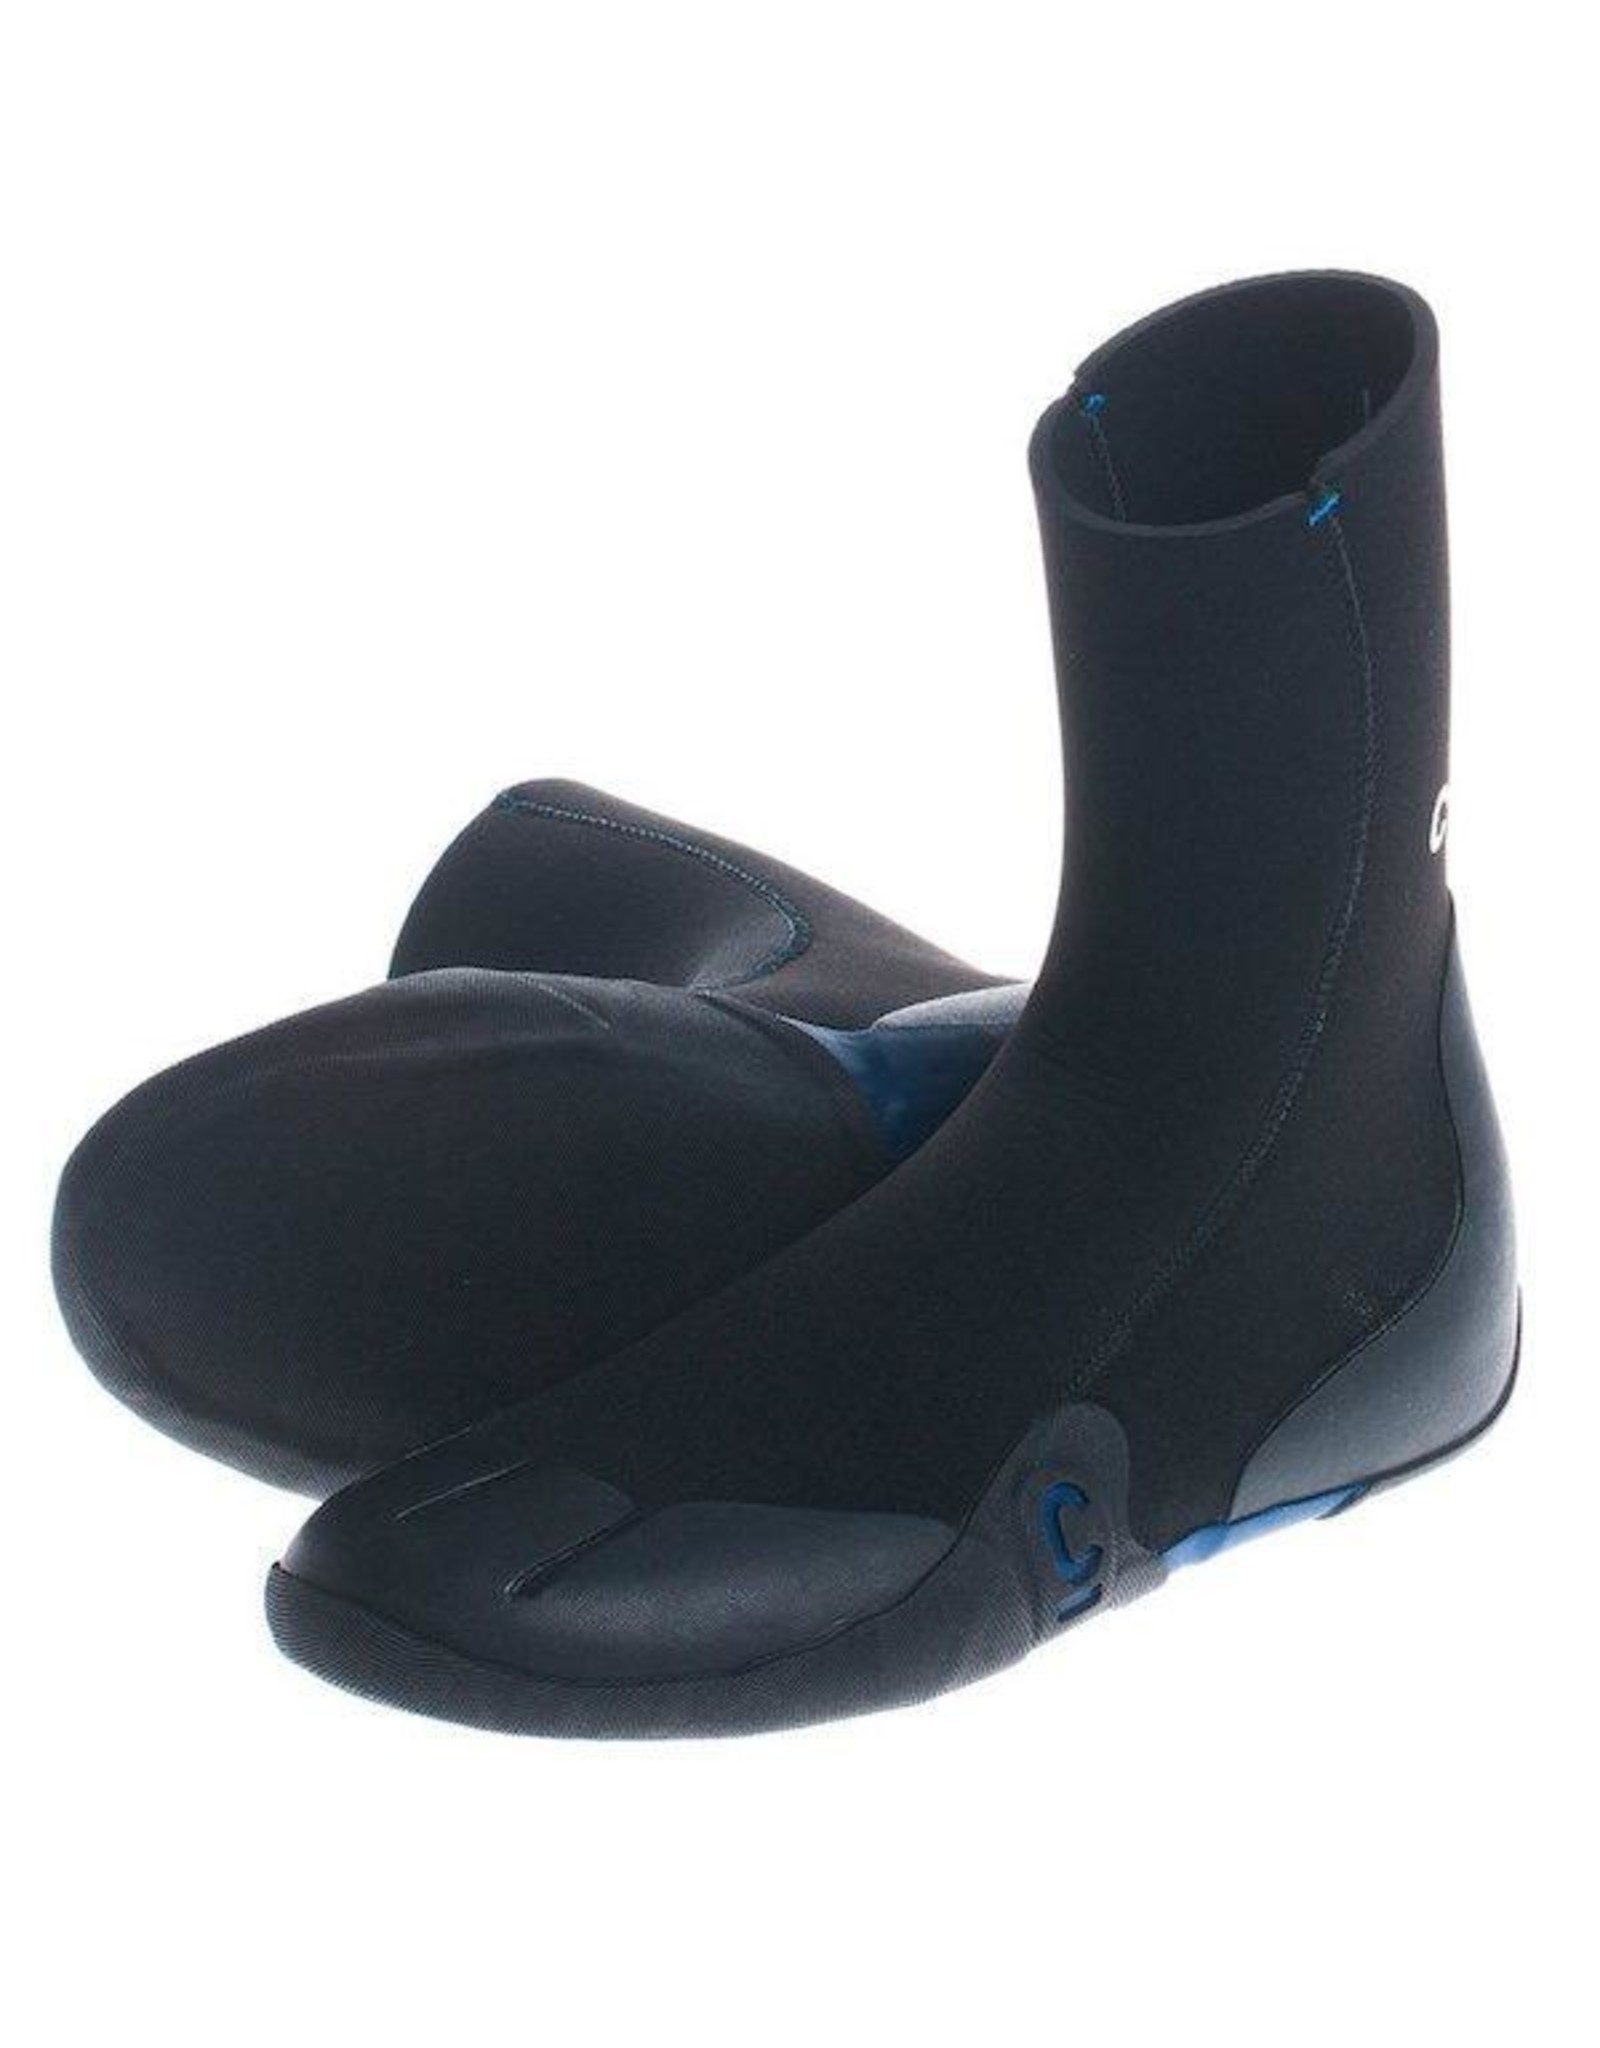 C-Skins C-Skins - 5mm - Legend - US7/39 - Round Toe Boot